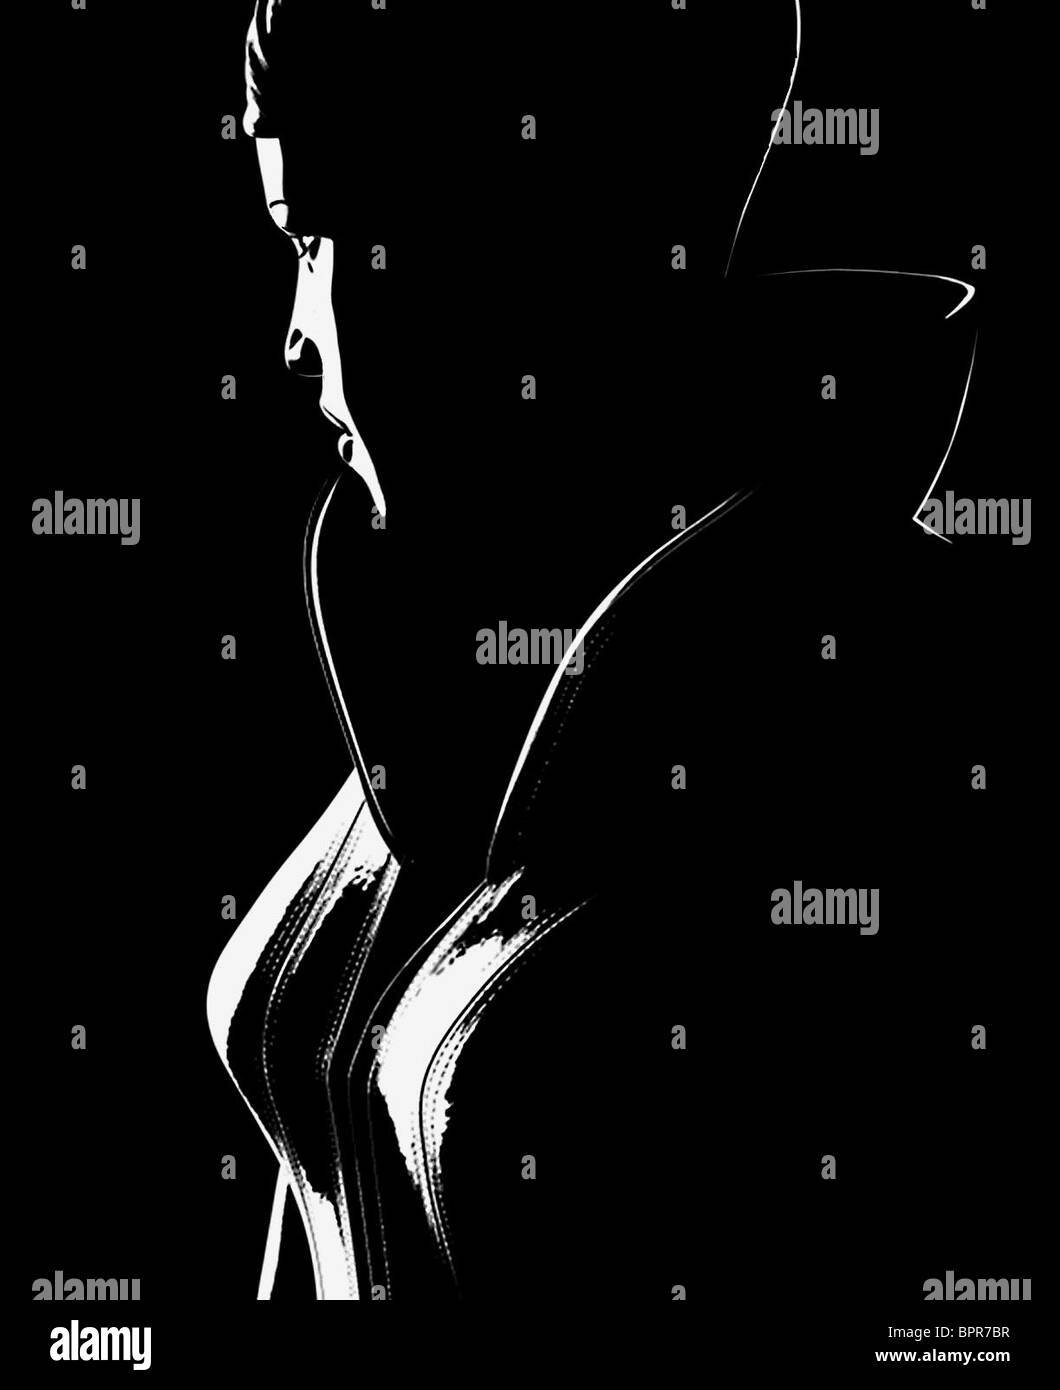 RISLANA TASUIEV RENAISSANCE (2006) Stockbild